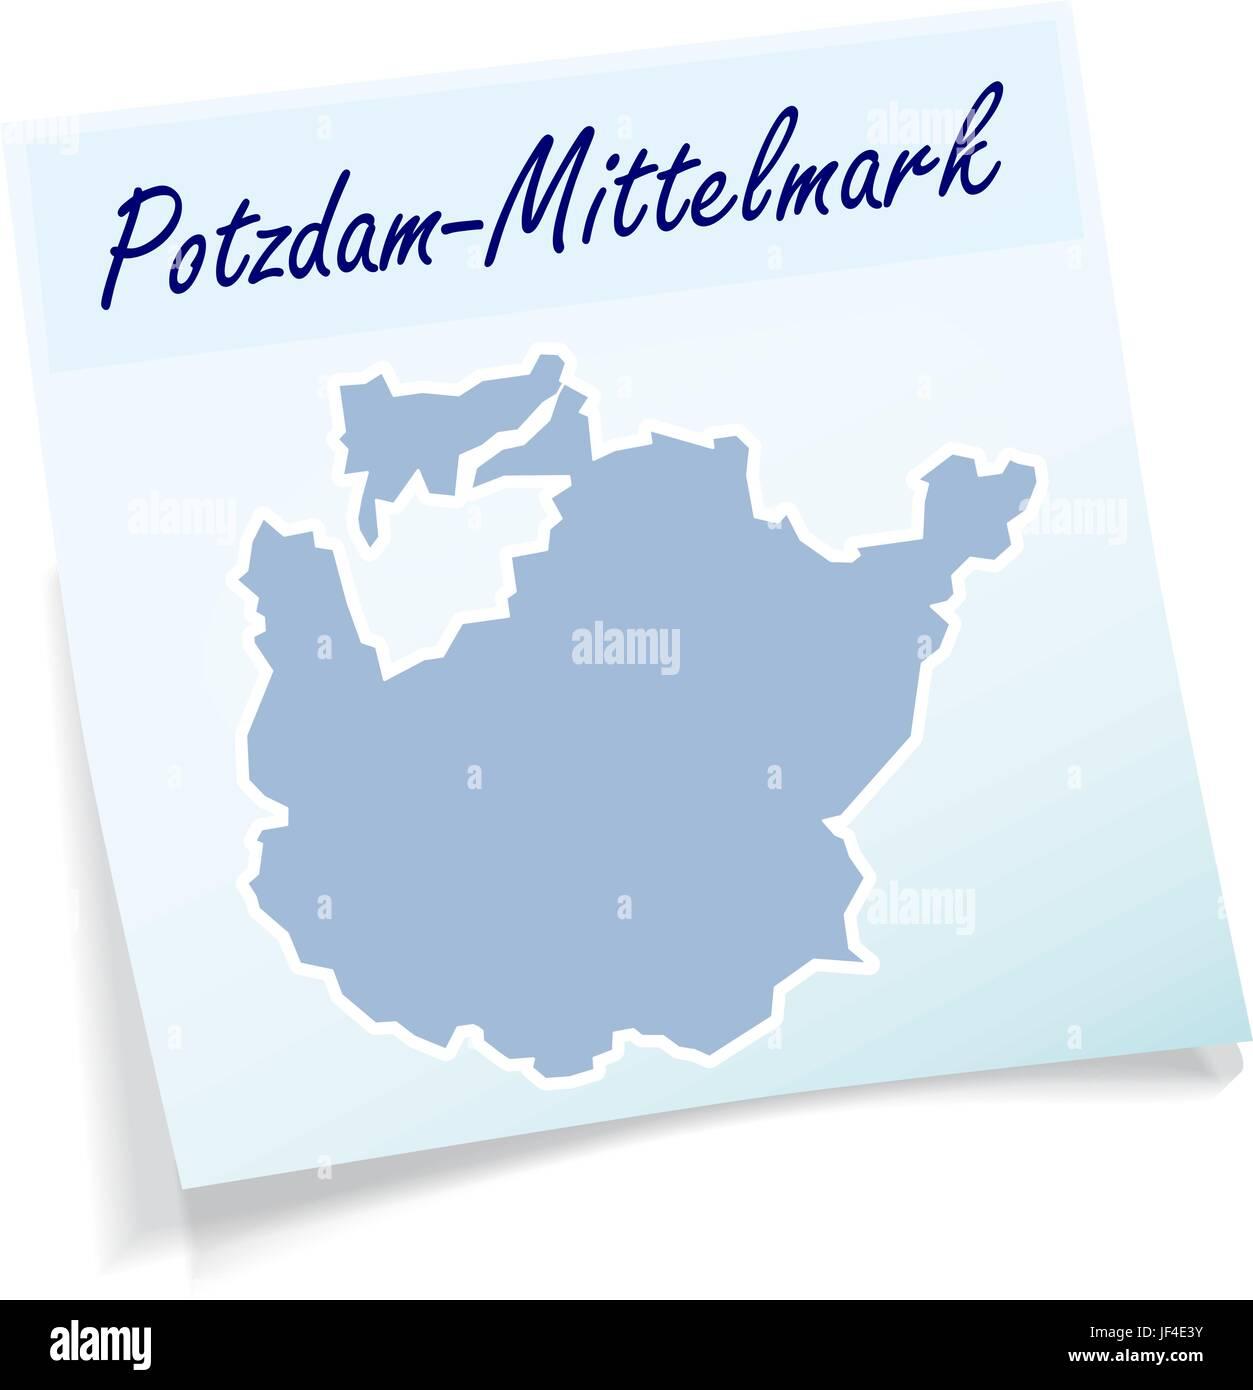 potsdam-mittelmark as sticky notes - Stock Vector